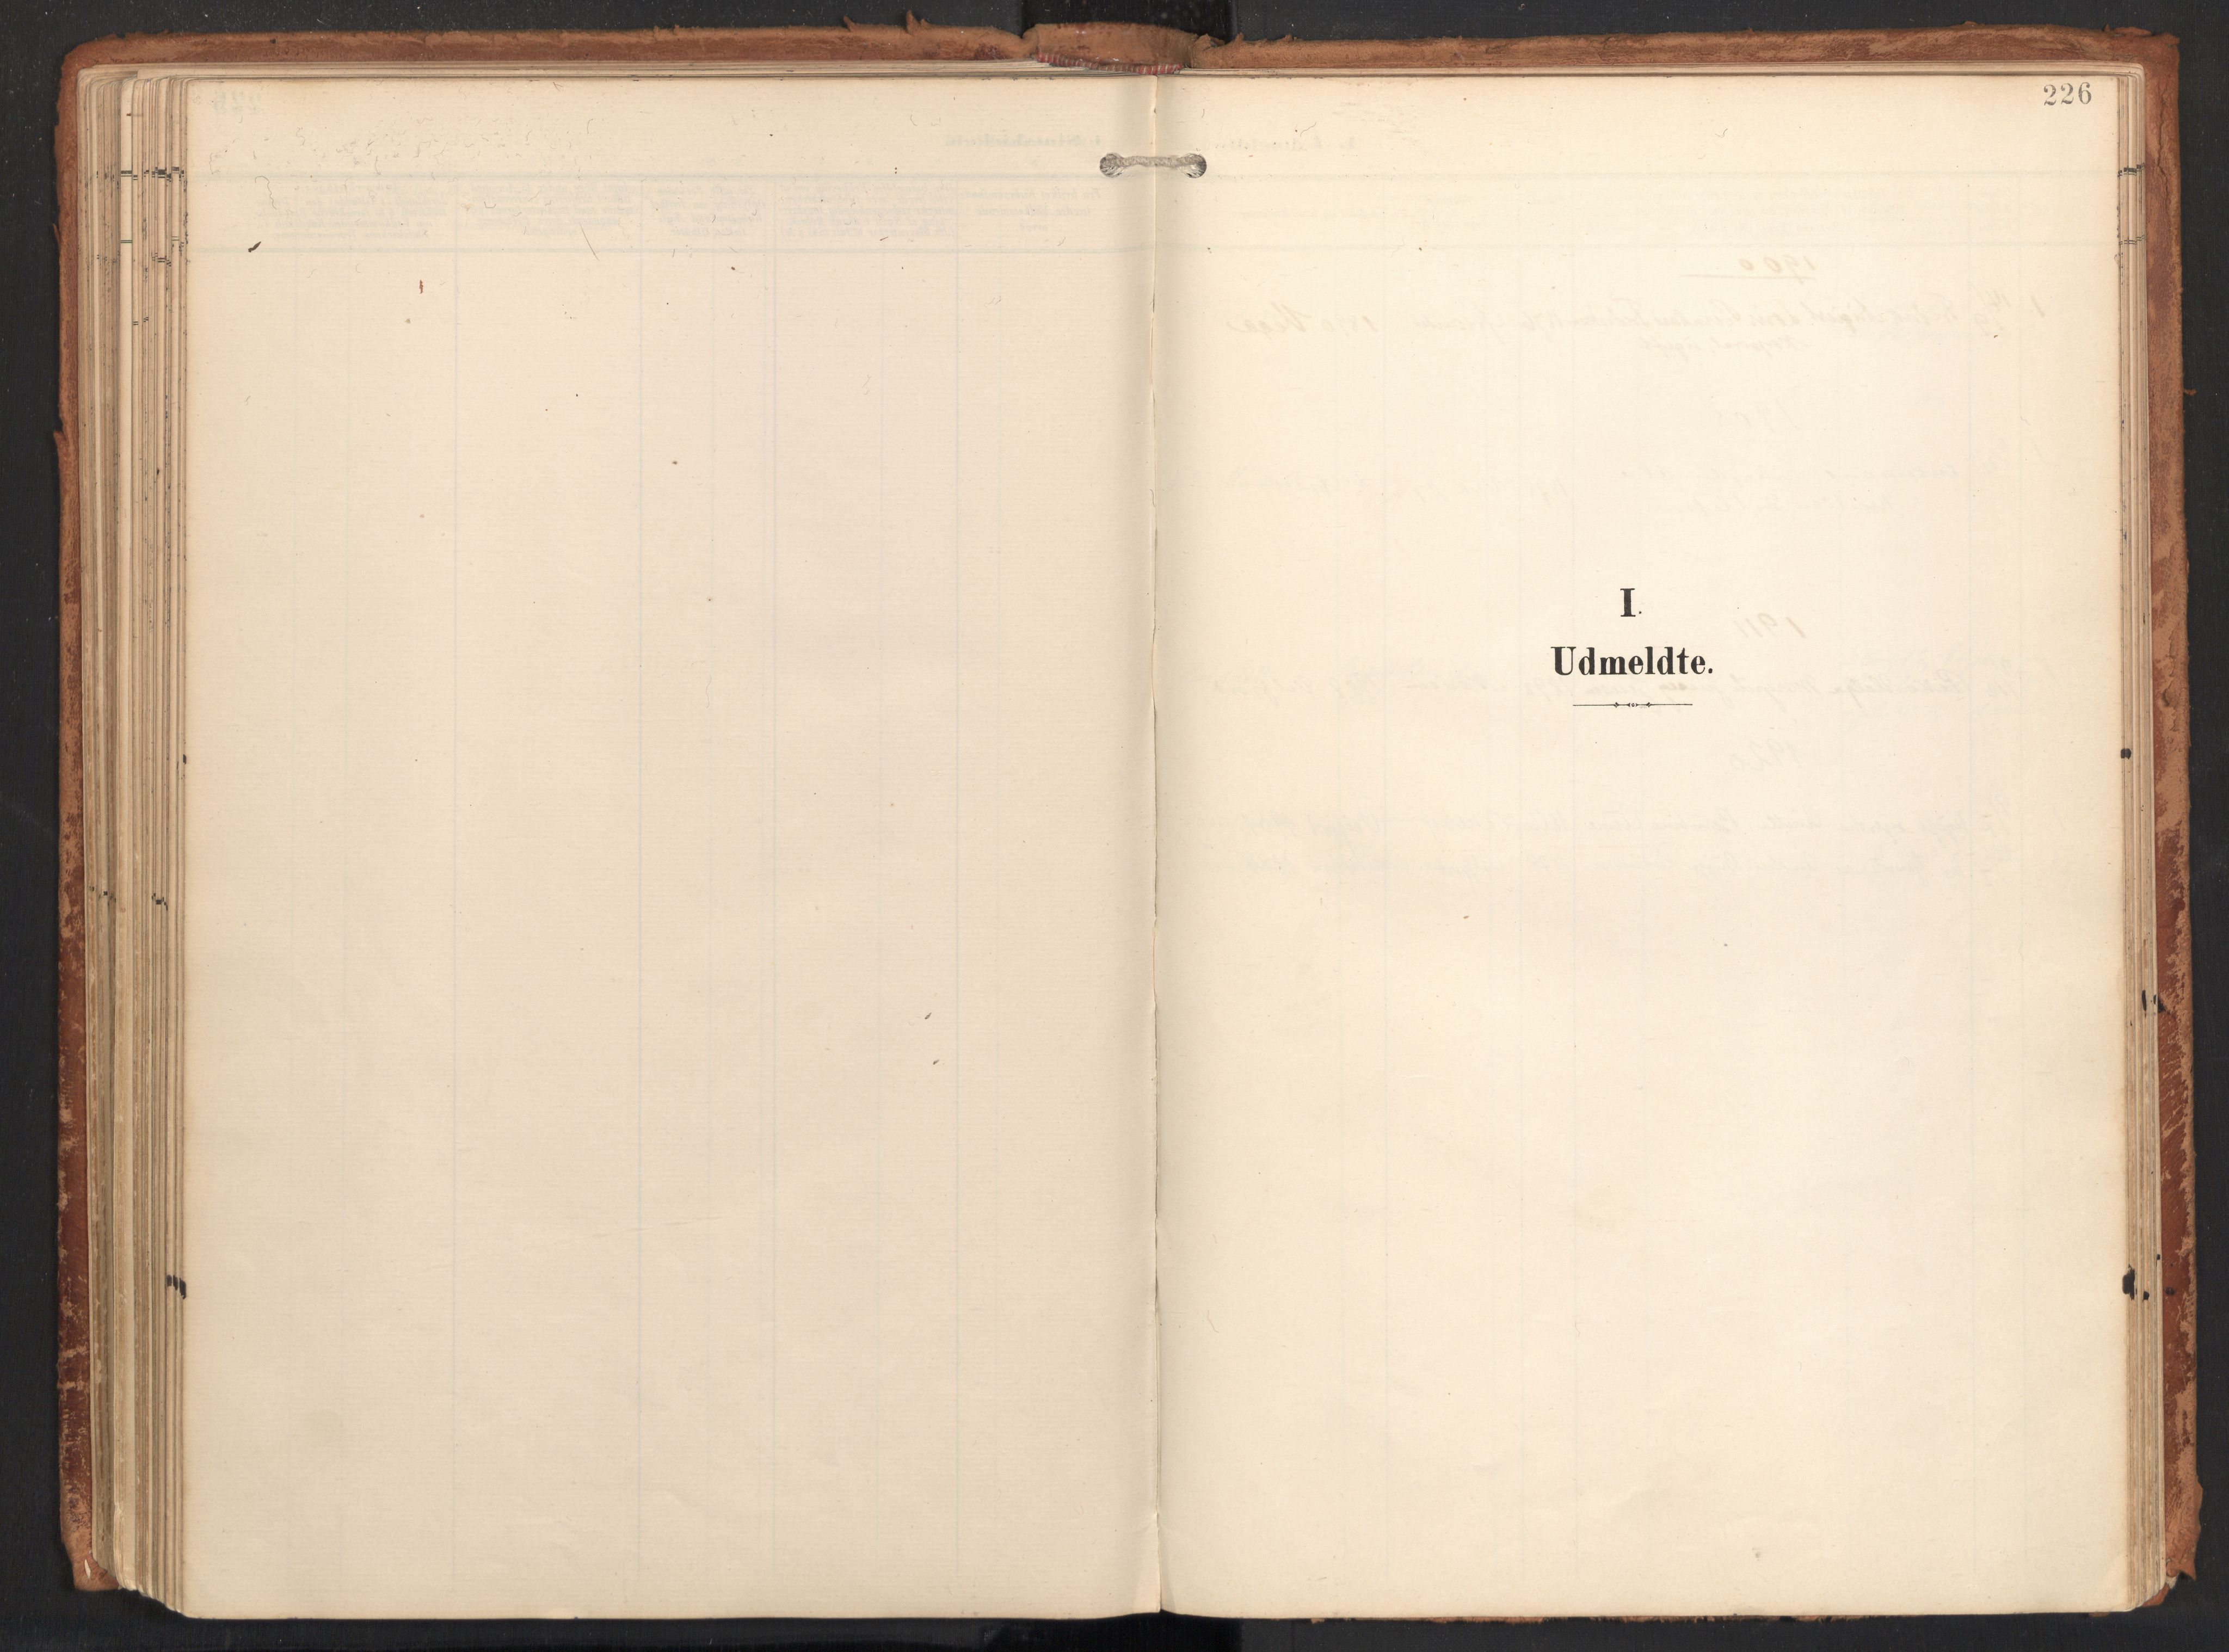 SAT, Ministerialprotokoller, klokkerbøker og fødselsregistre - Nordland, 814/L0227: Ministerialbok nr. 814A08, 1899-1920, s. 226